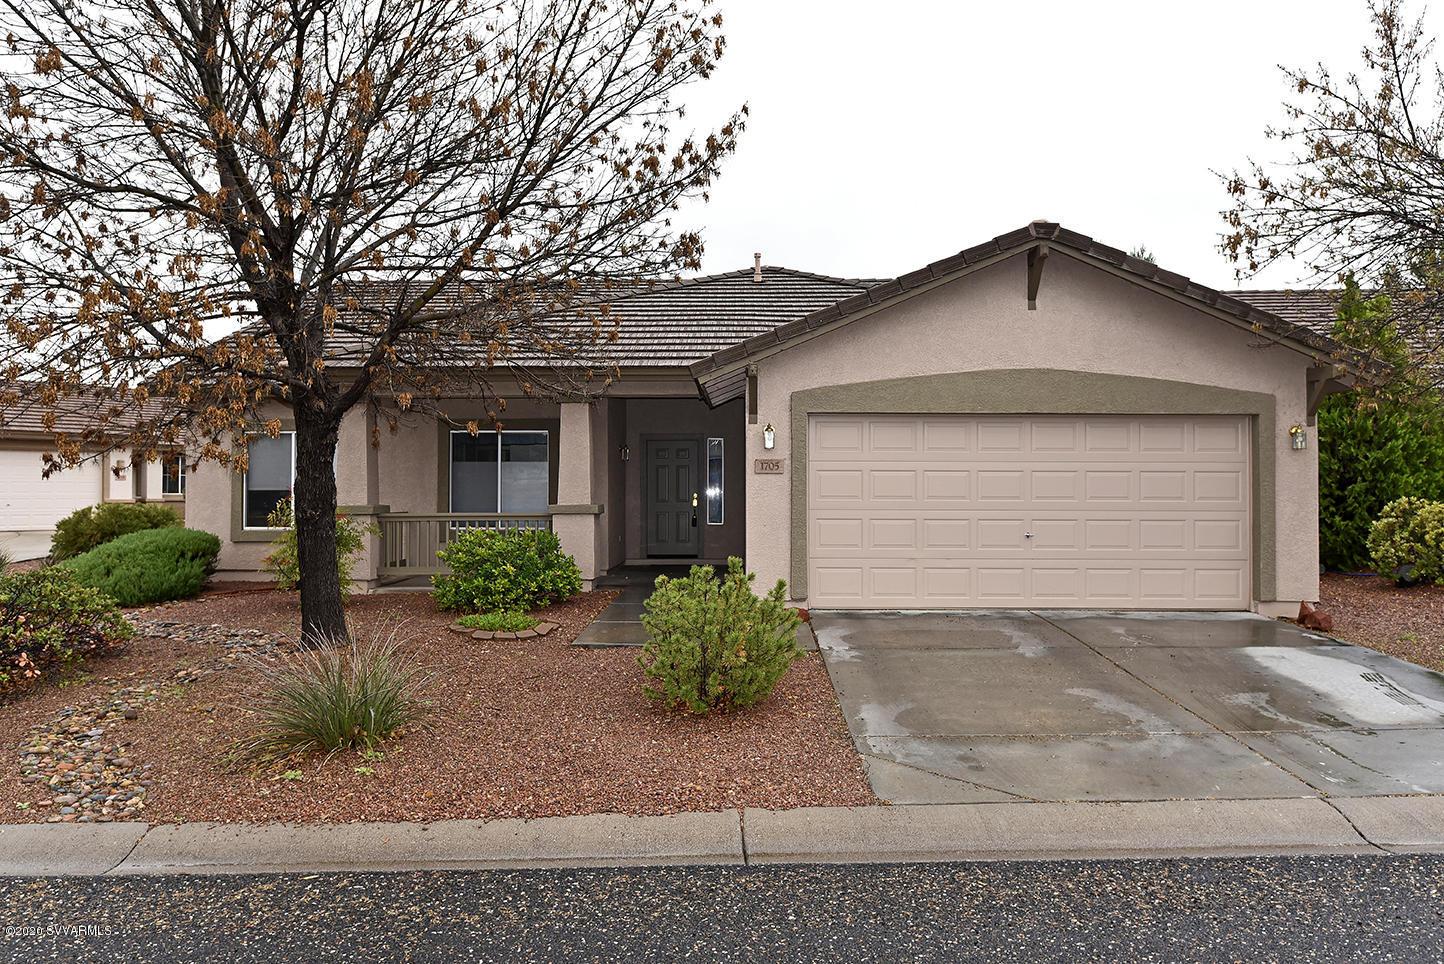 1705 W Desert Willow Drive Cottonwood, AZ 86326